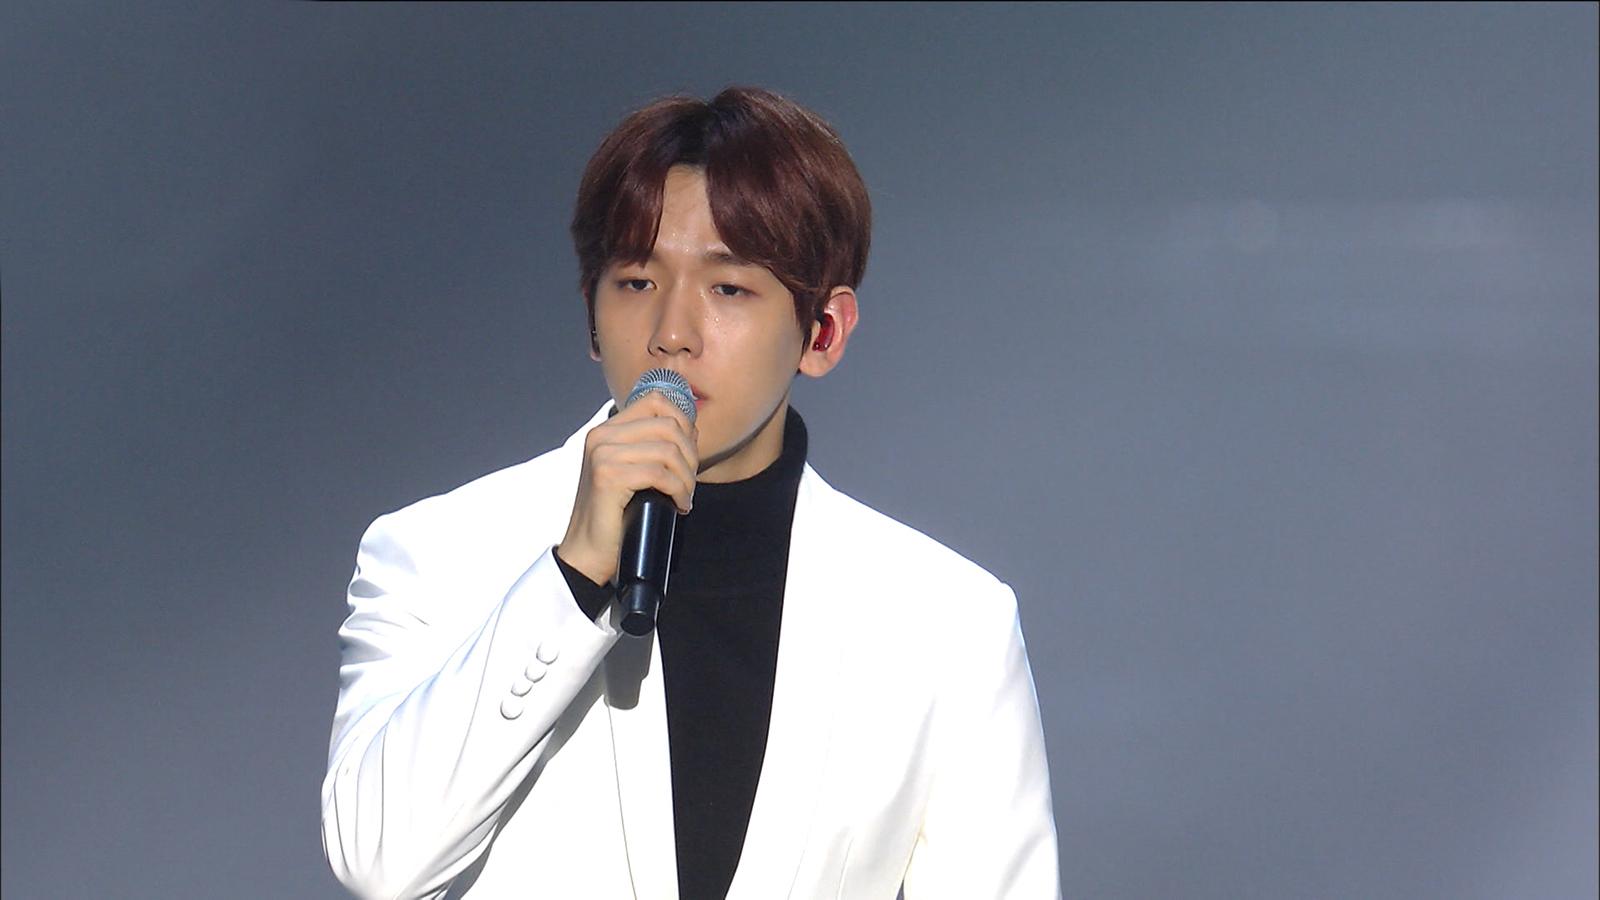 2018 SBS Gayo Daejeon_Music Festival Episode 1